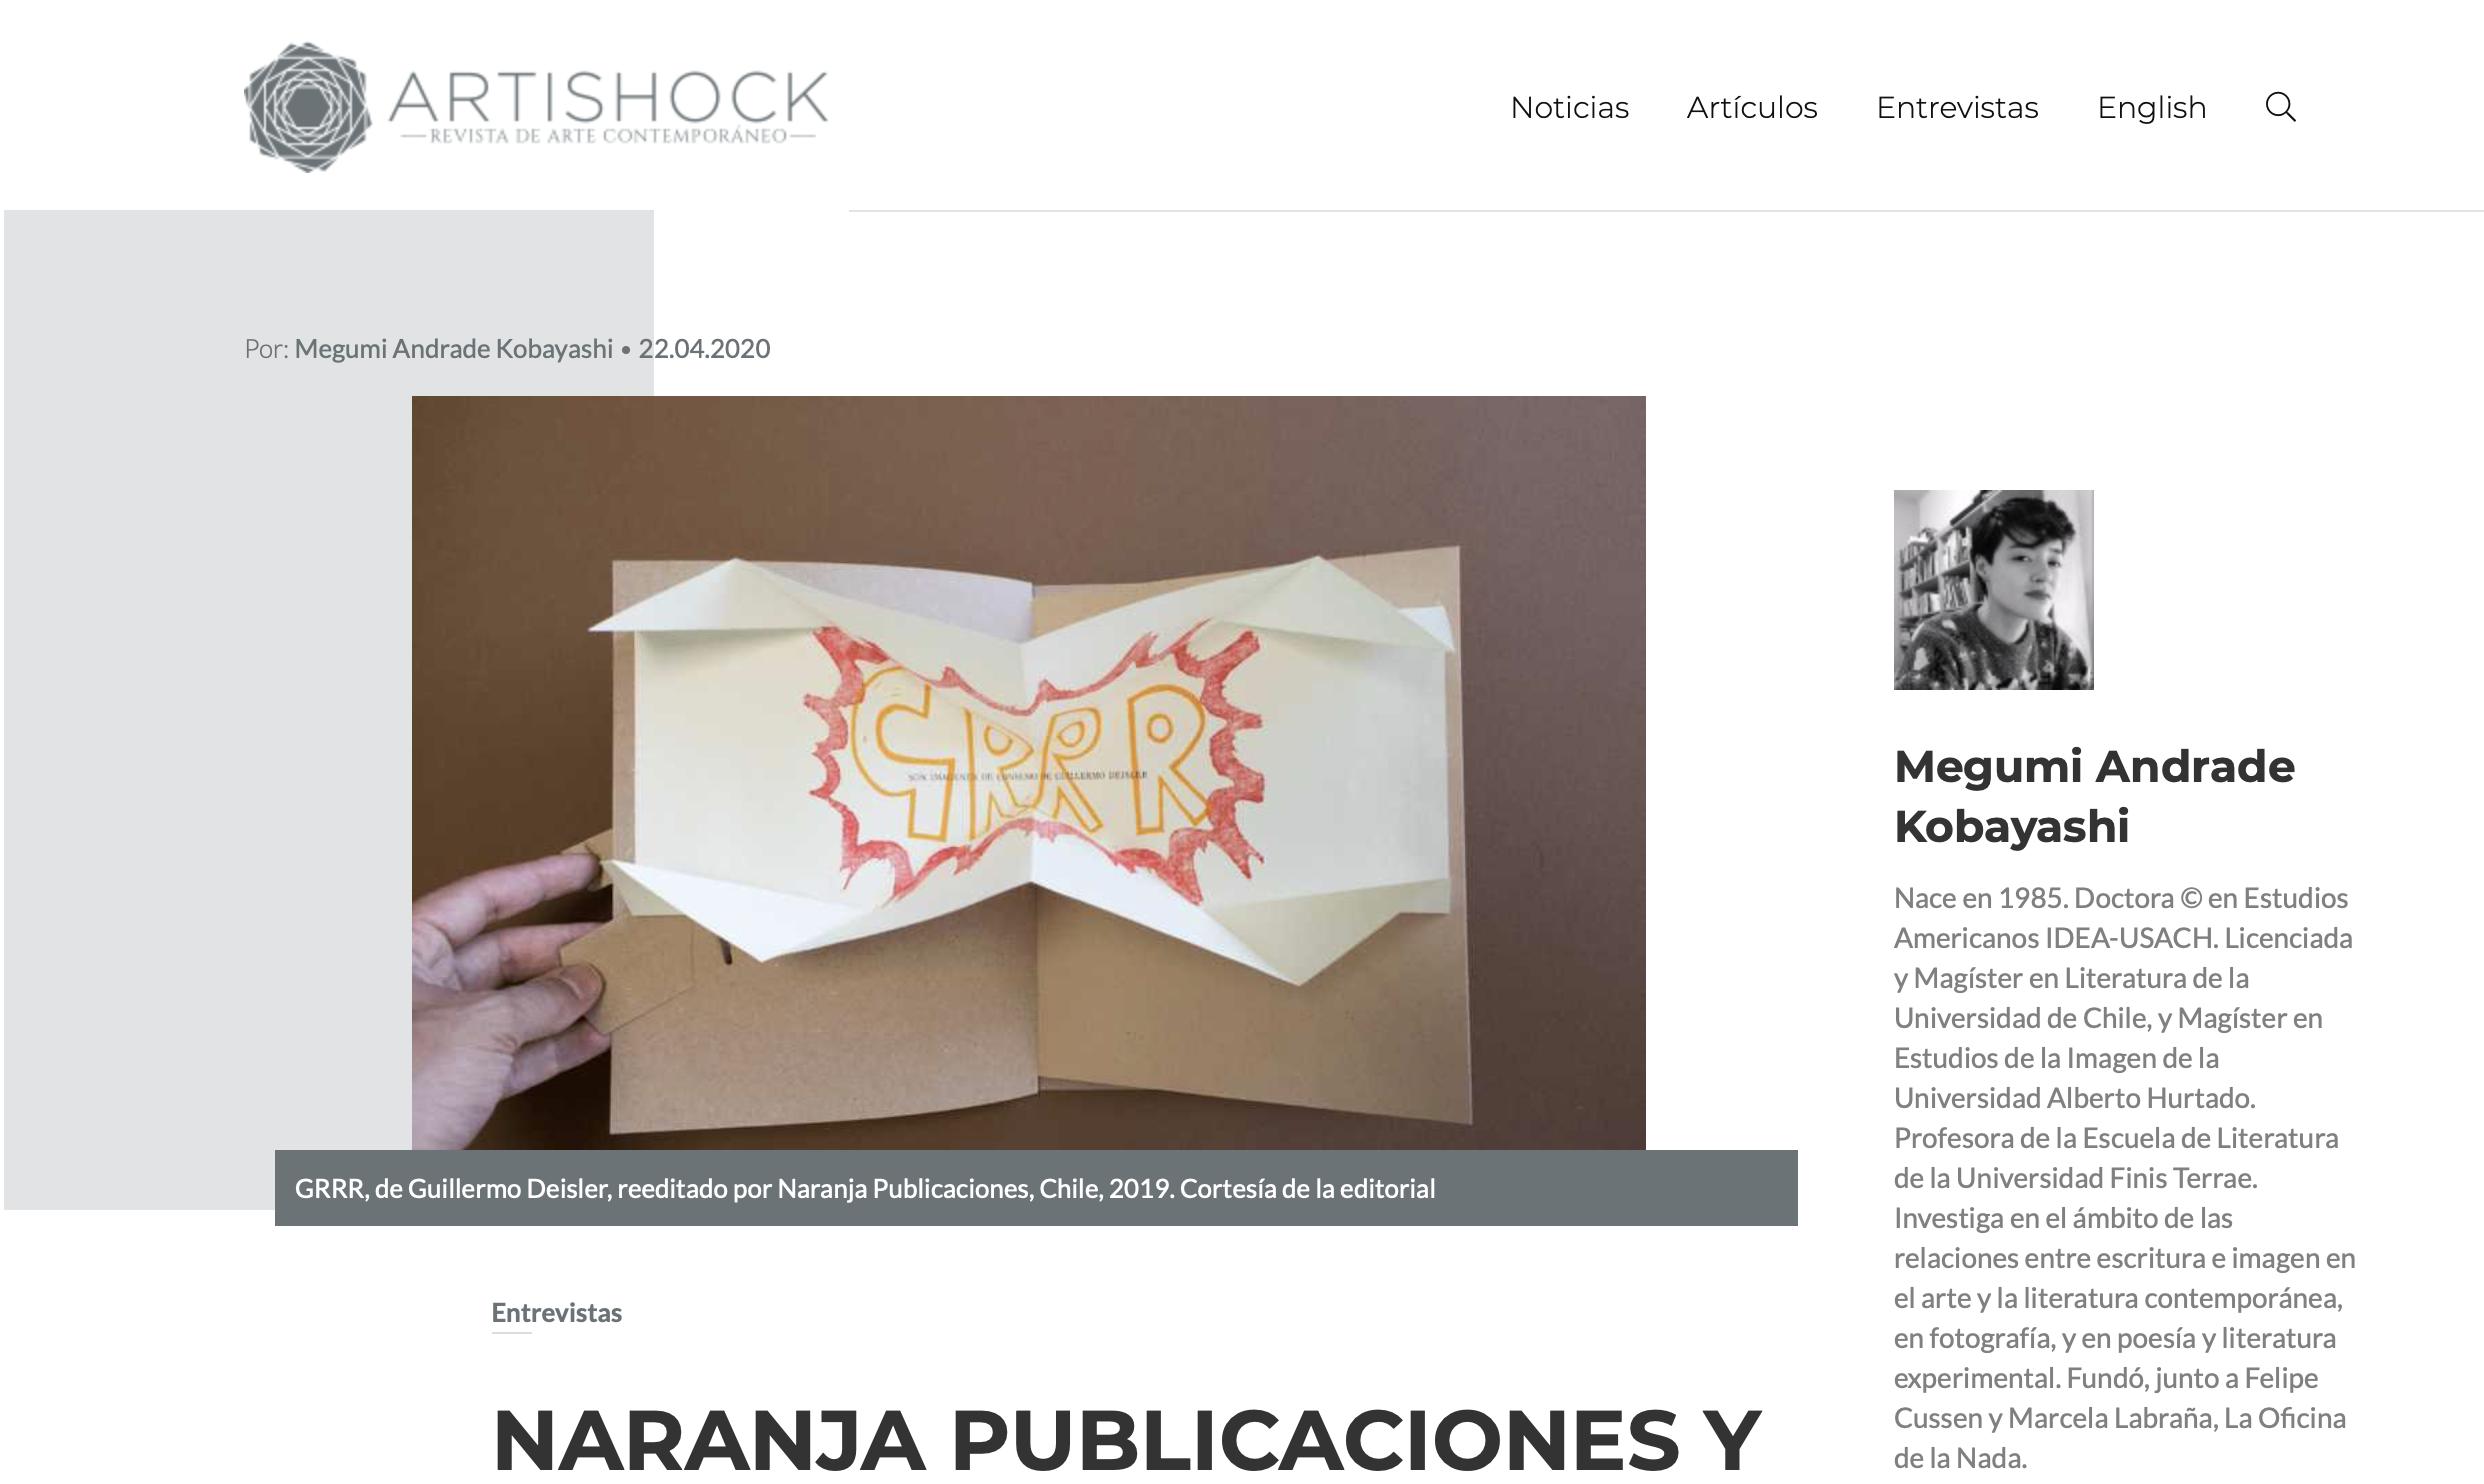 Entrevista de Megumi Andrade a Naranja en Artishock